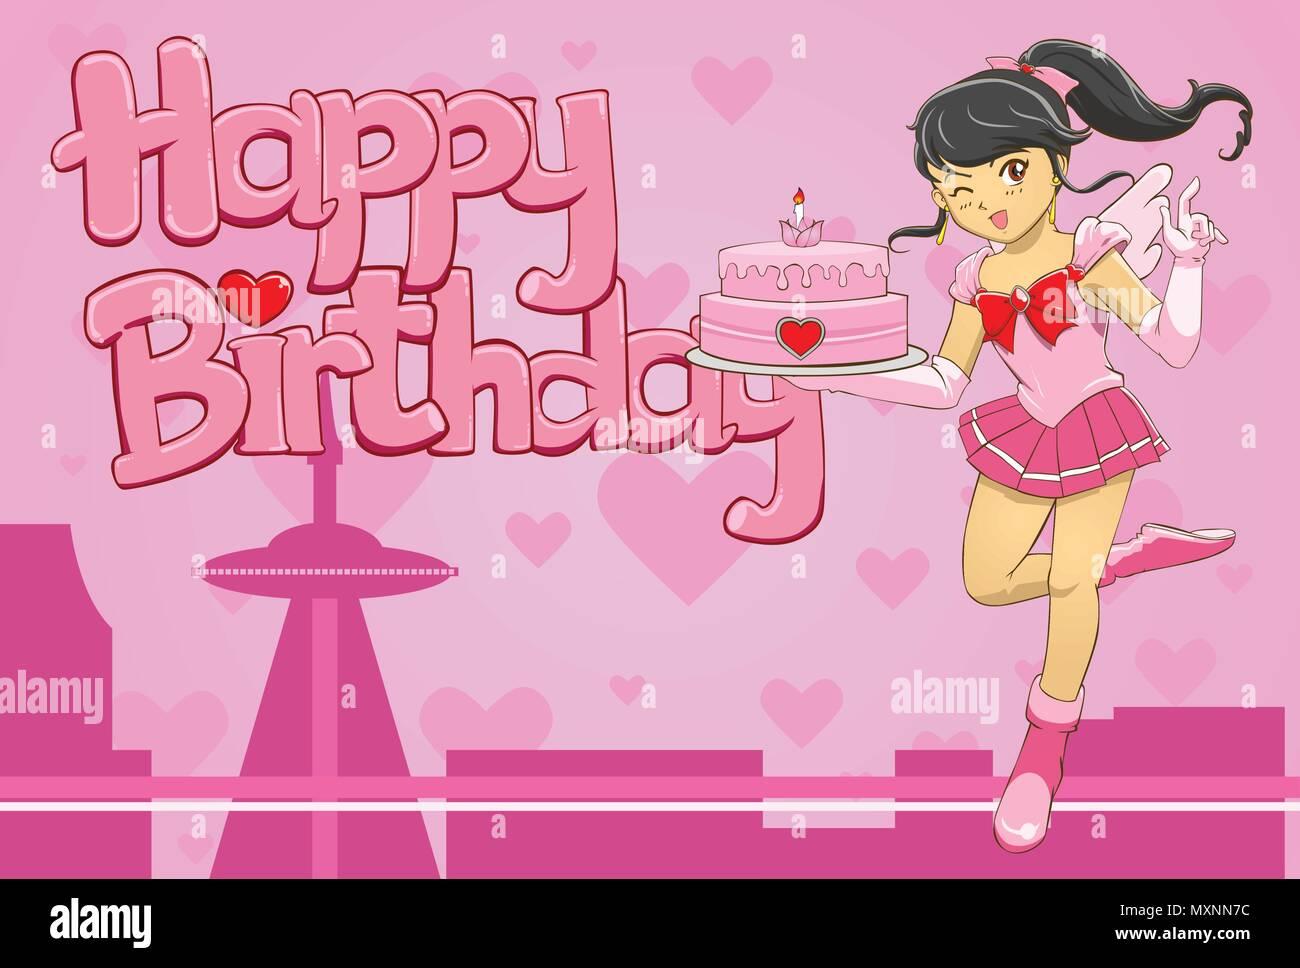 a vector illustration of little hero girl bring a birthday cake - Stock Vector